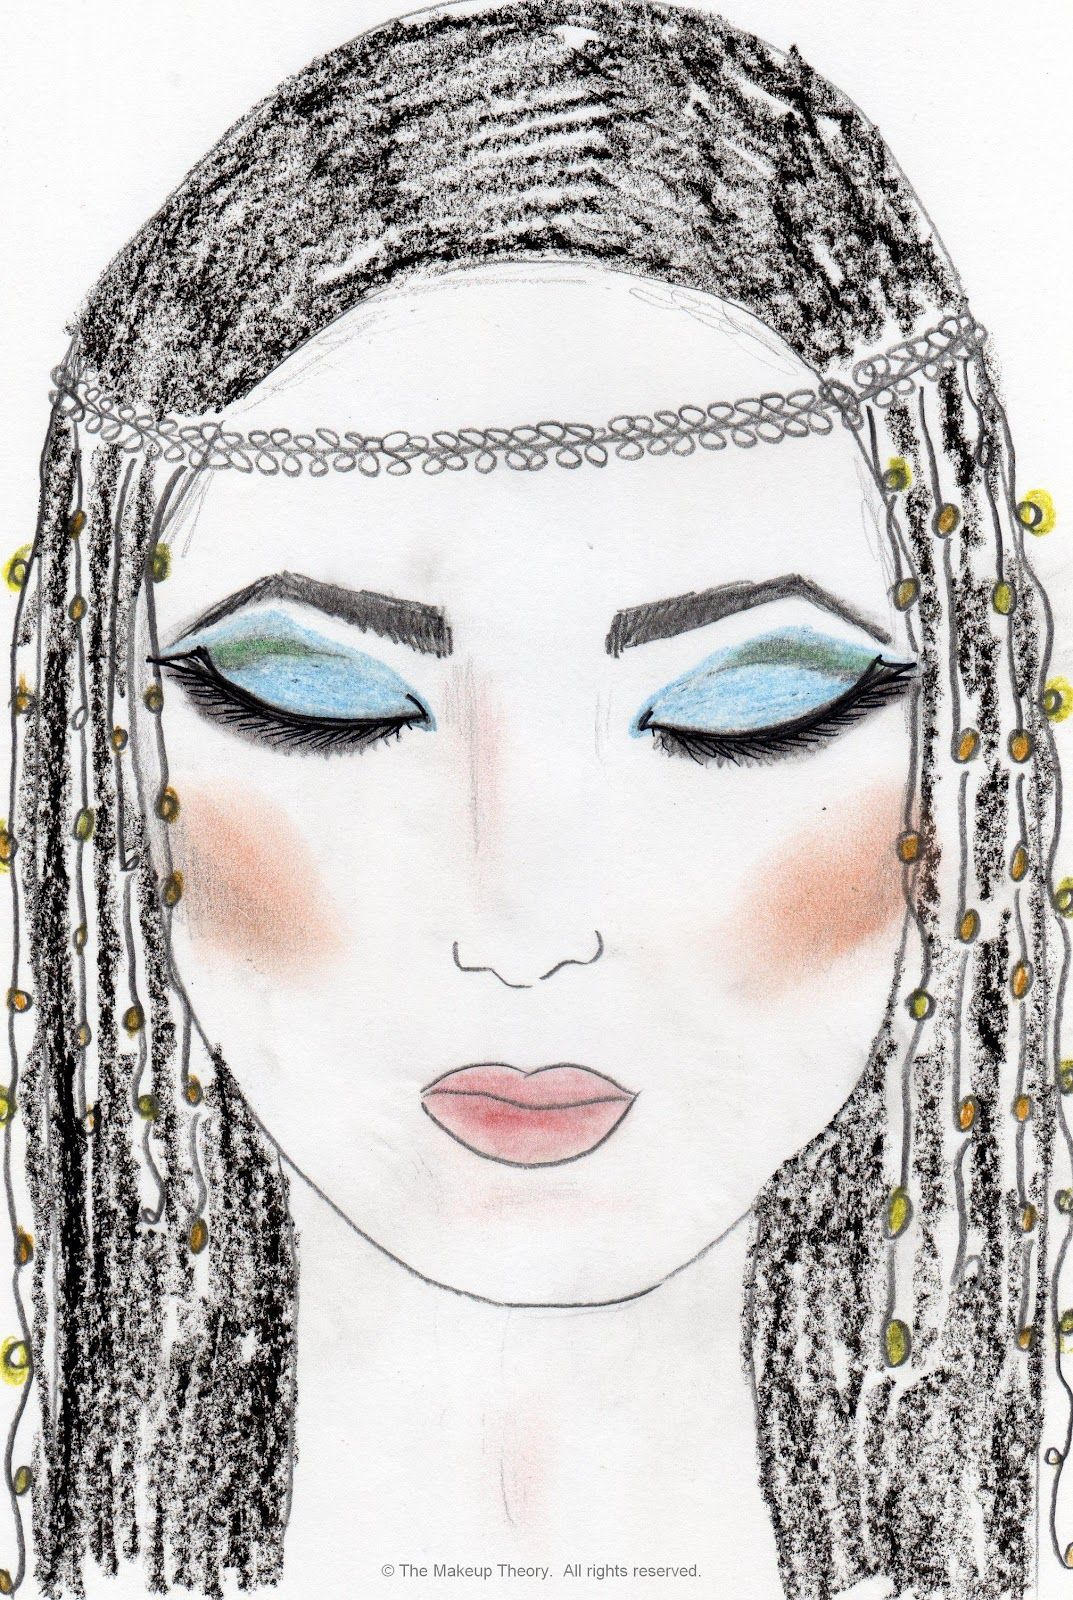 Egyptian Hair And Makeup History